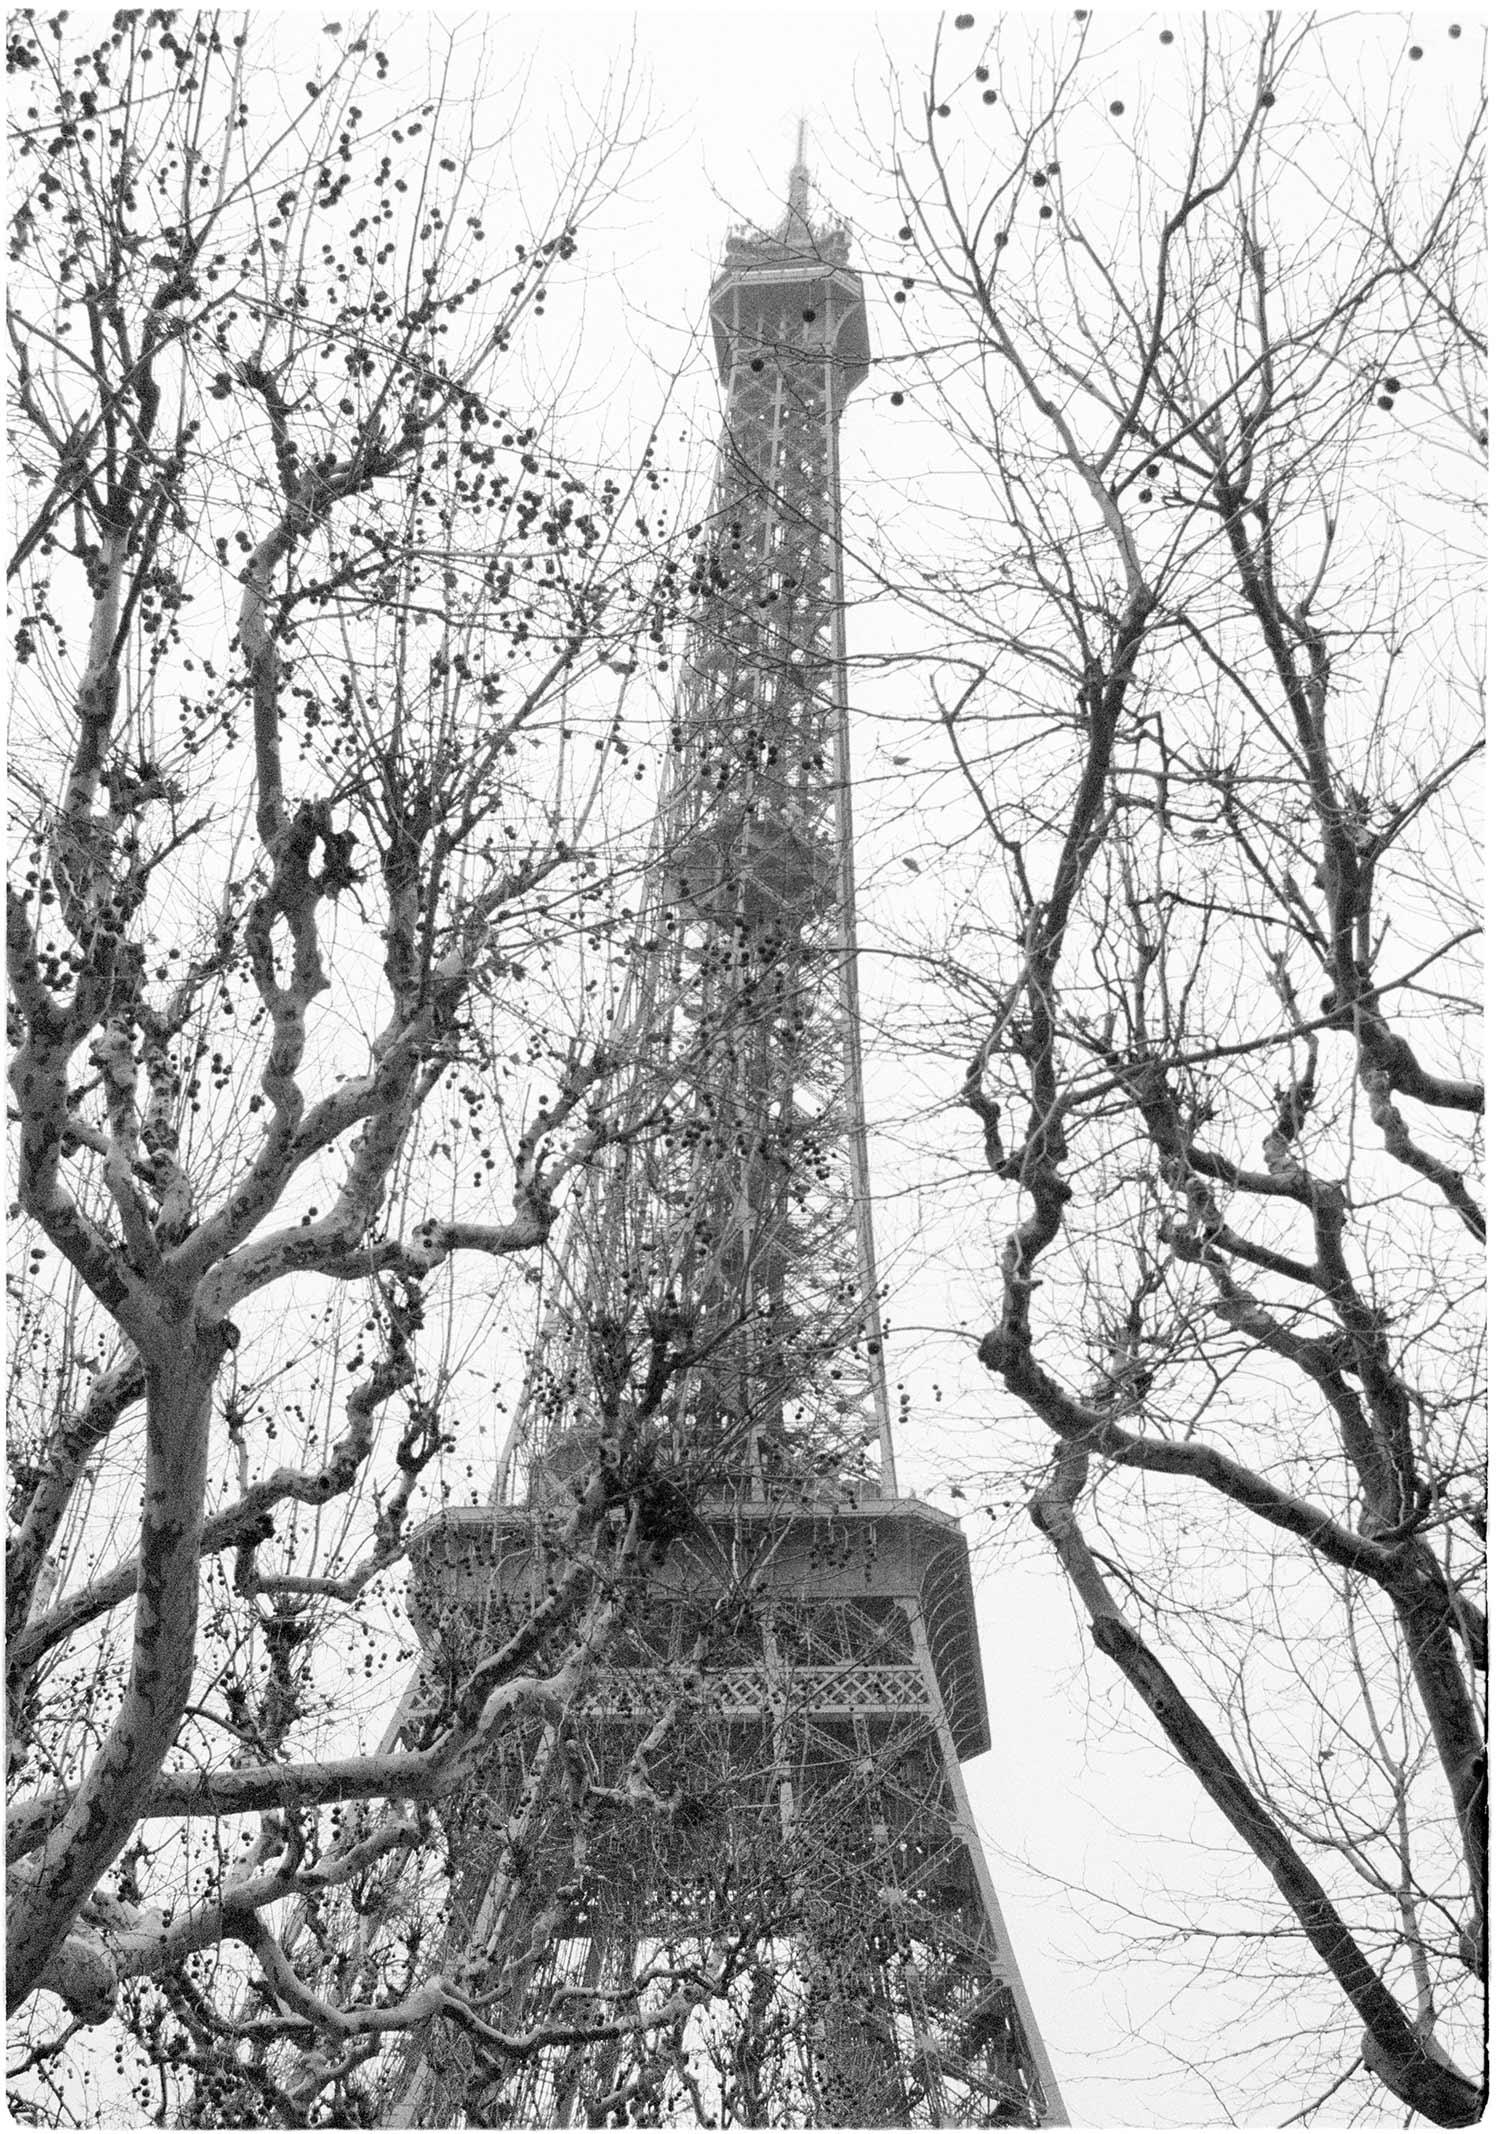 Eifel-Tower-web.jpg